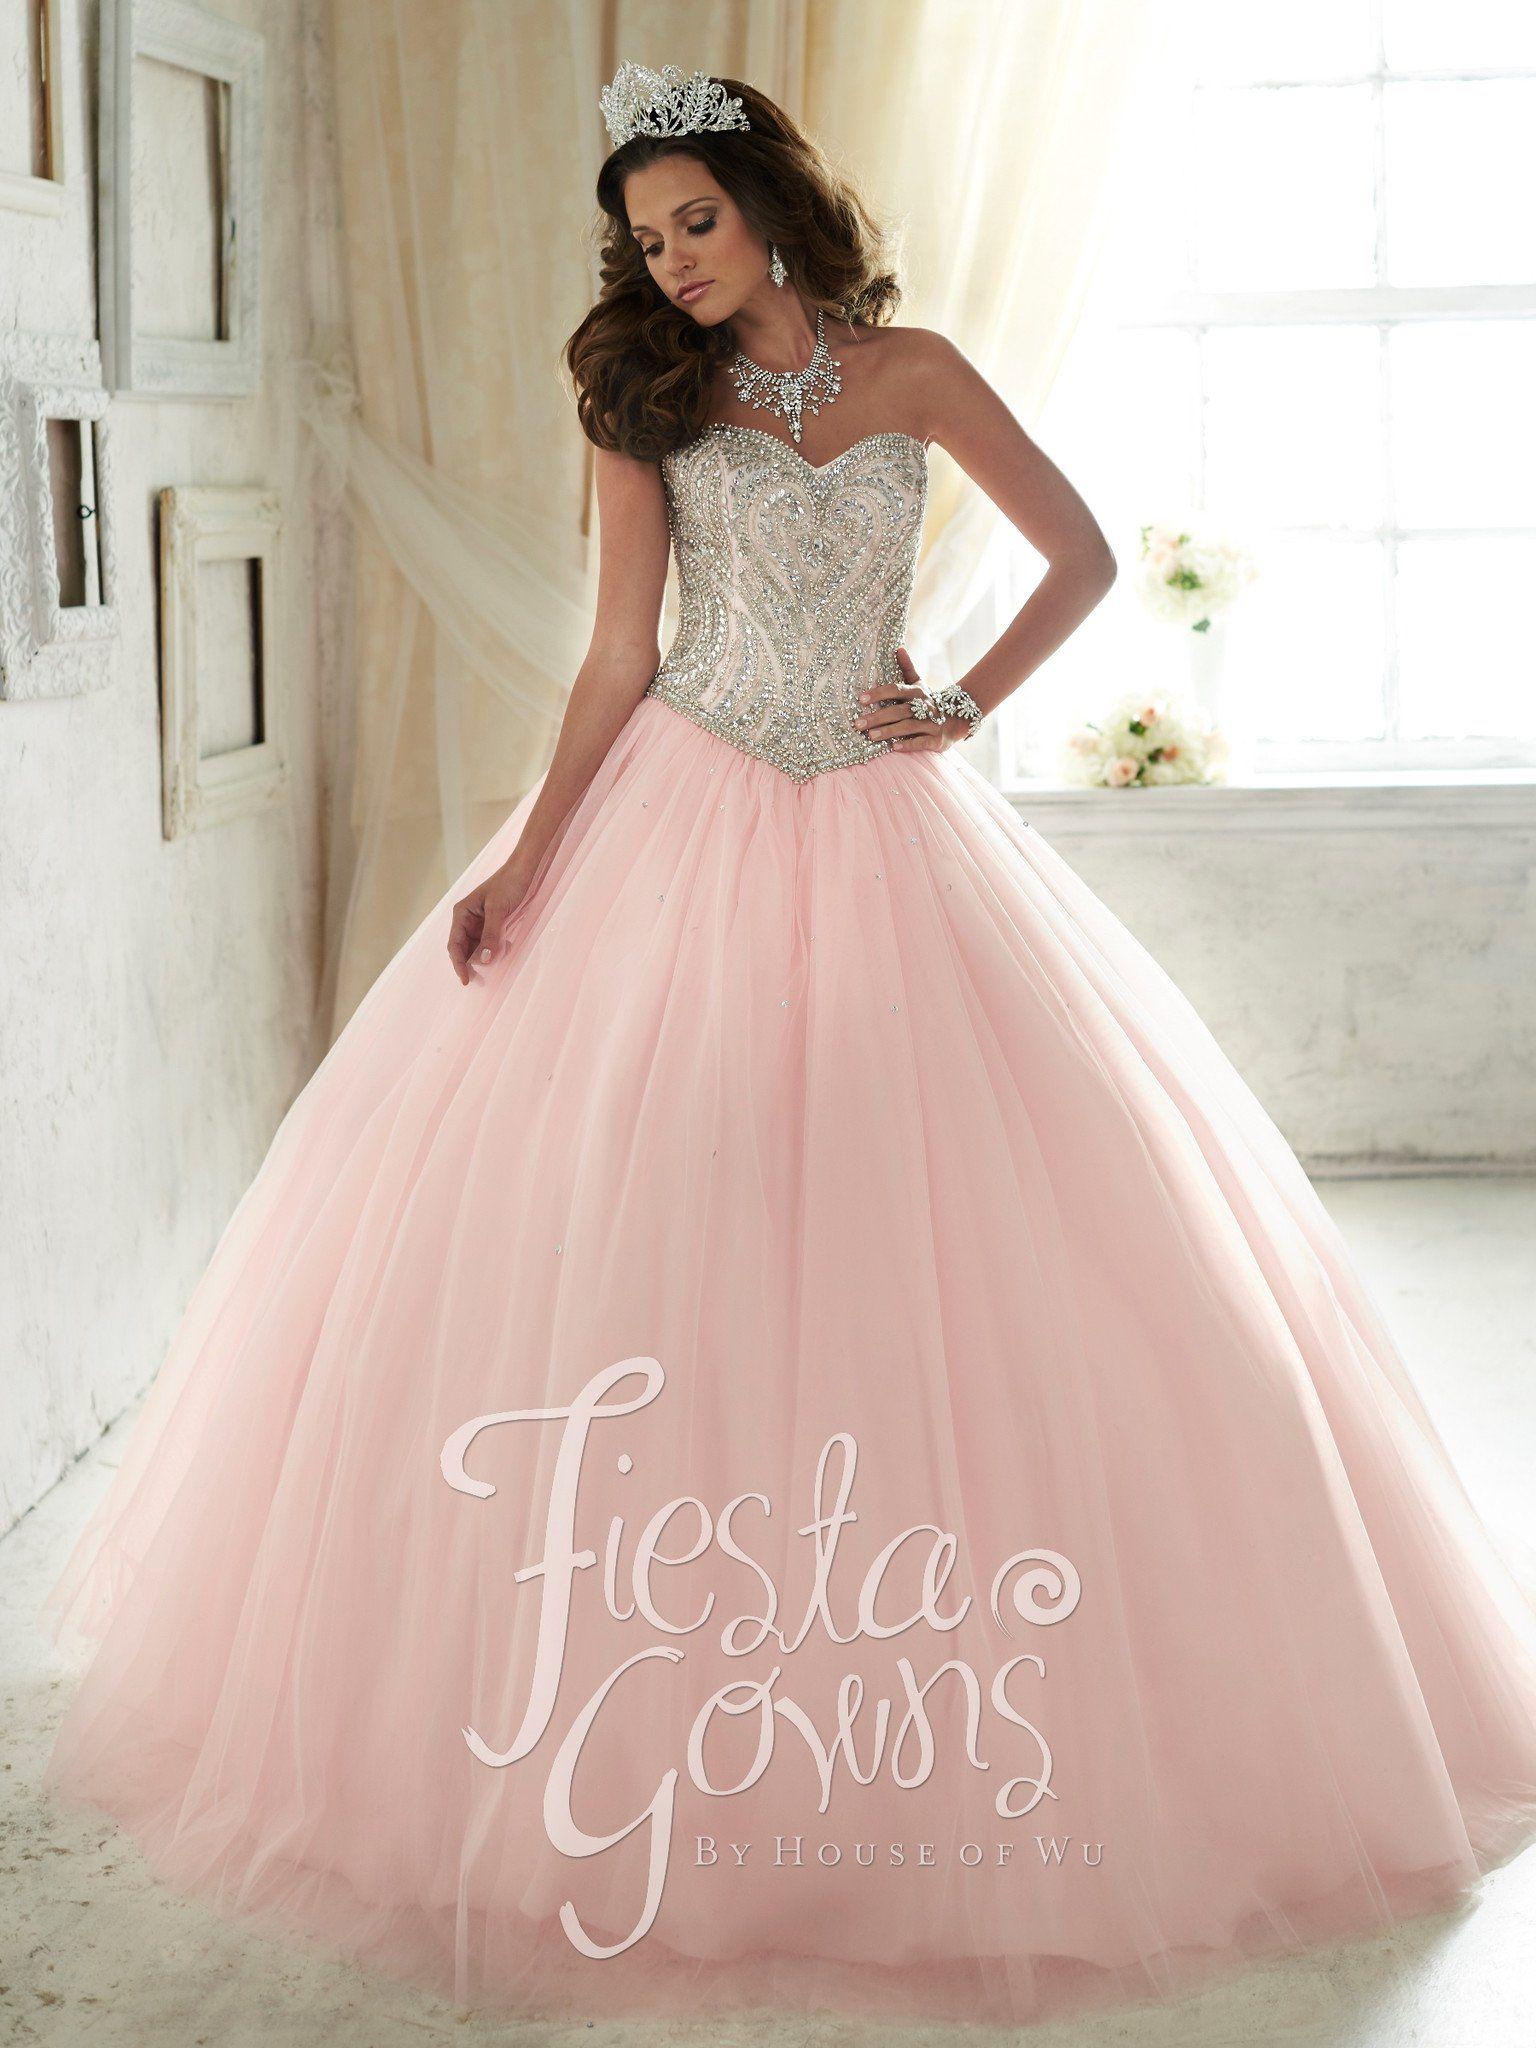 Robe mariage violette princesse en tulle   Robes de mariage   Pinterest